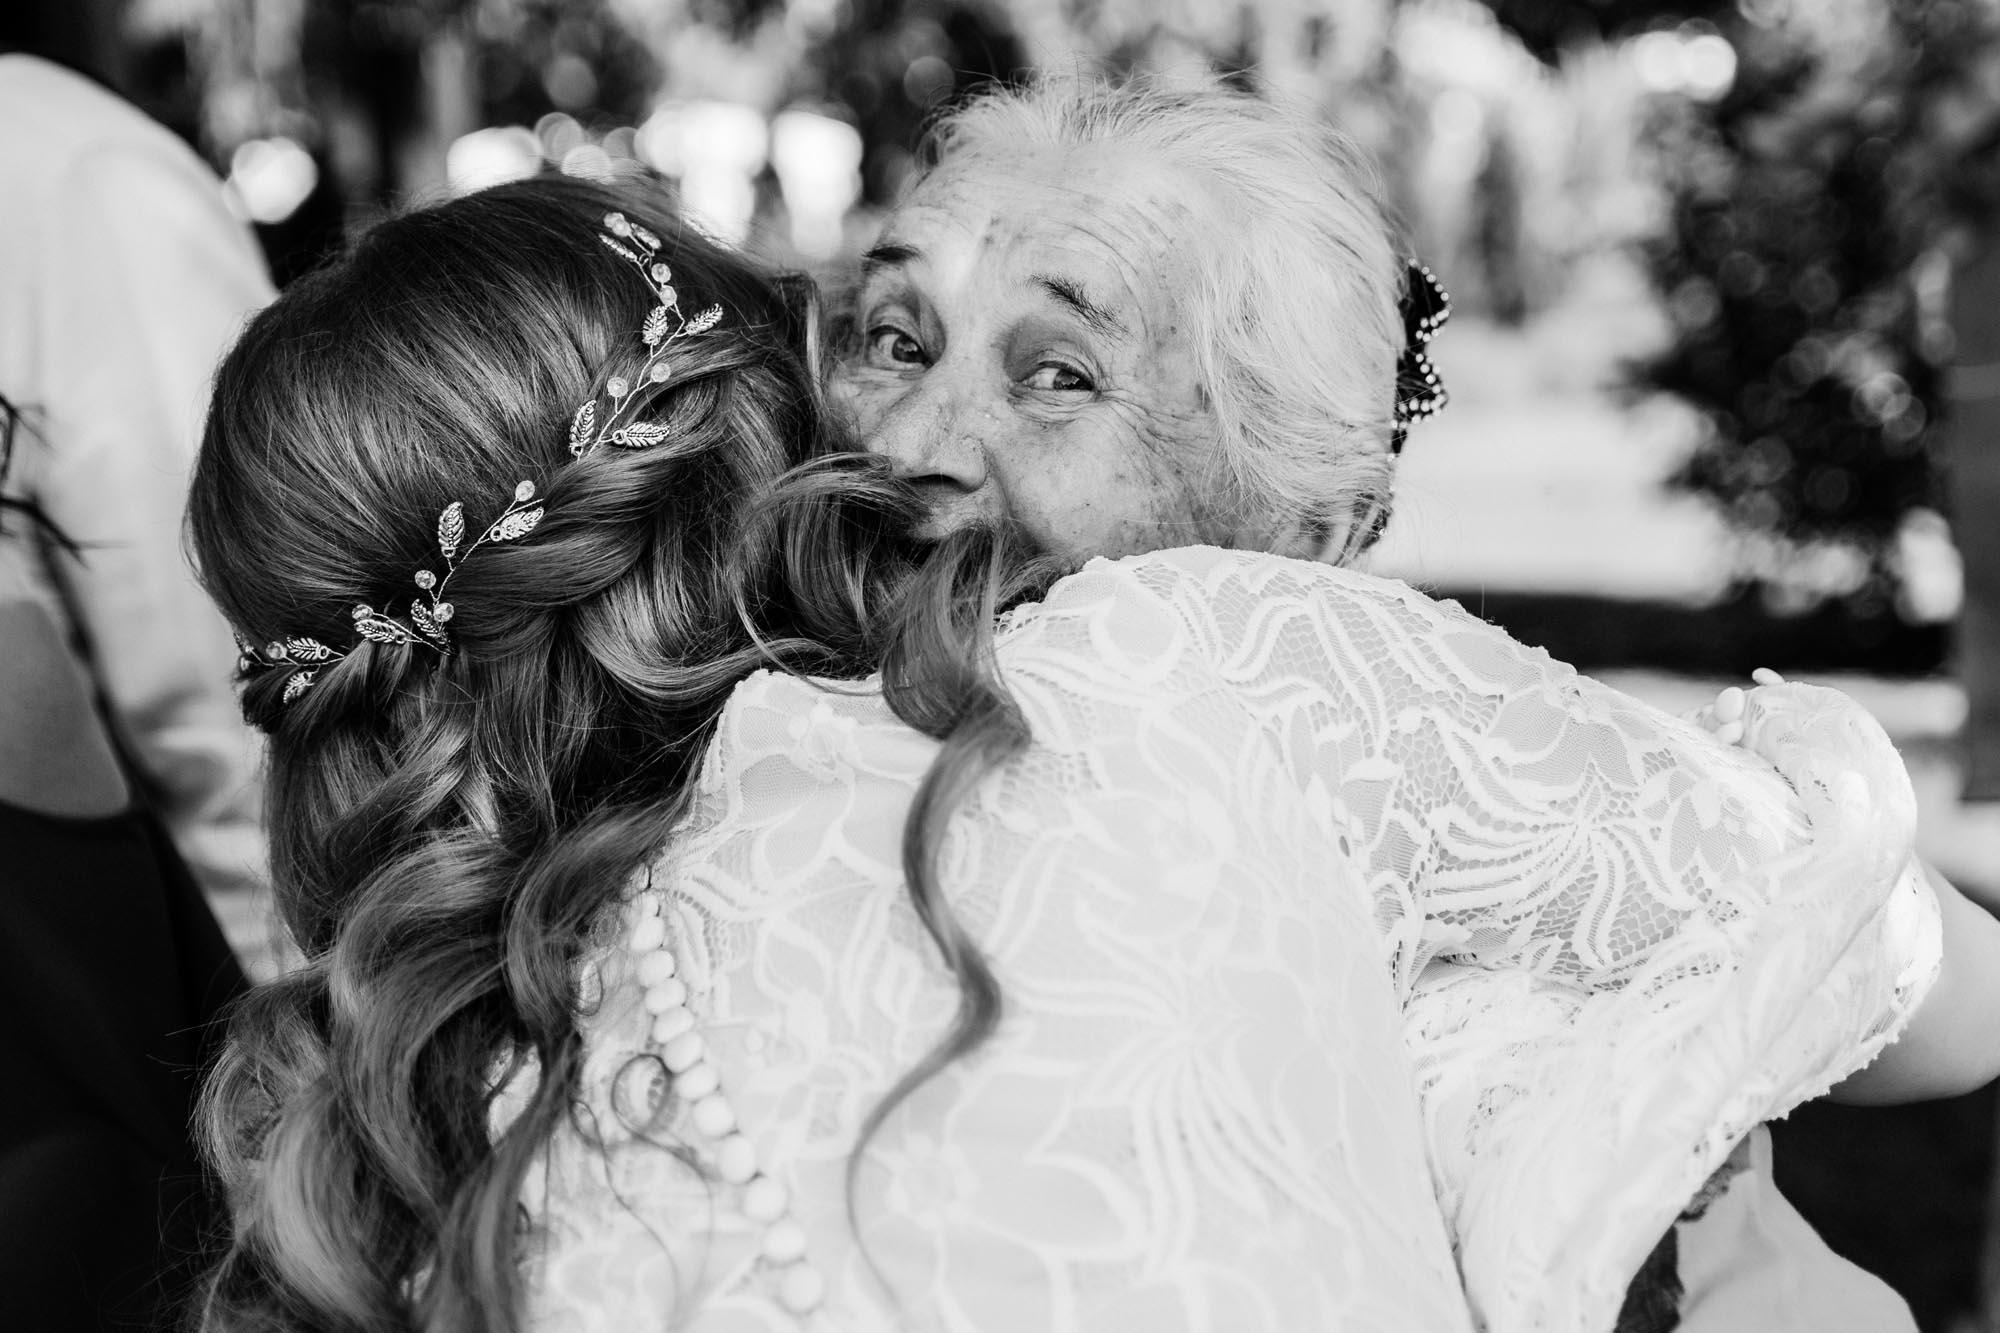 искренние эмоции гостей на свадьбе